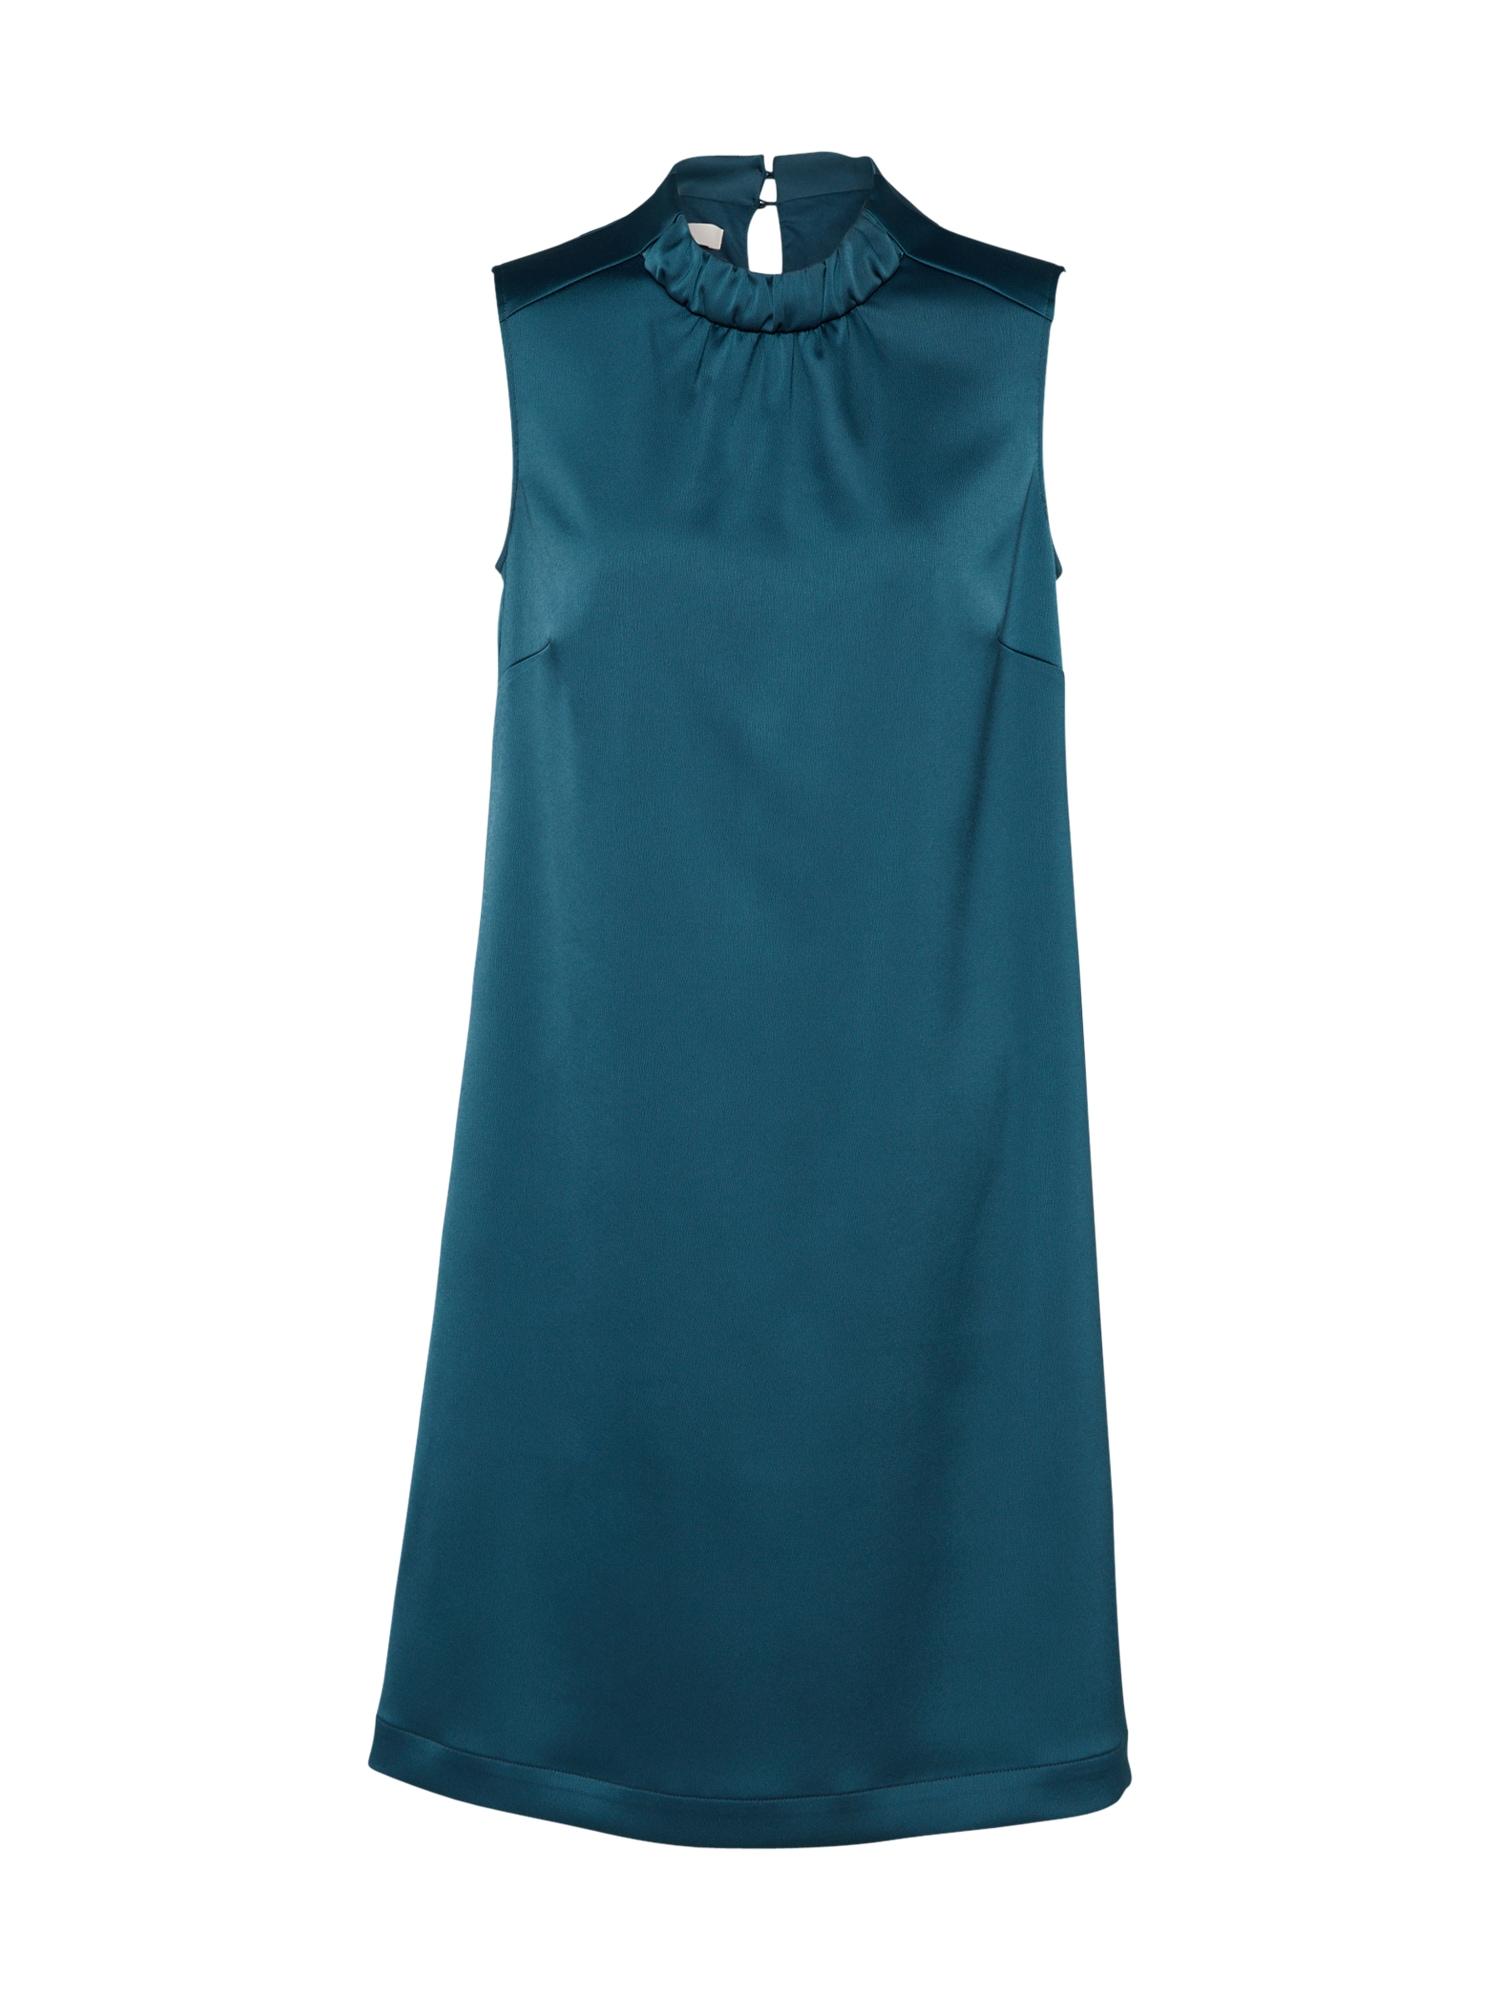 Šaty Gewebe tmavě modrá Talkabout